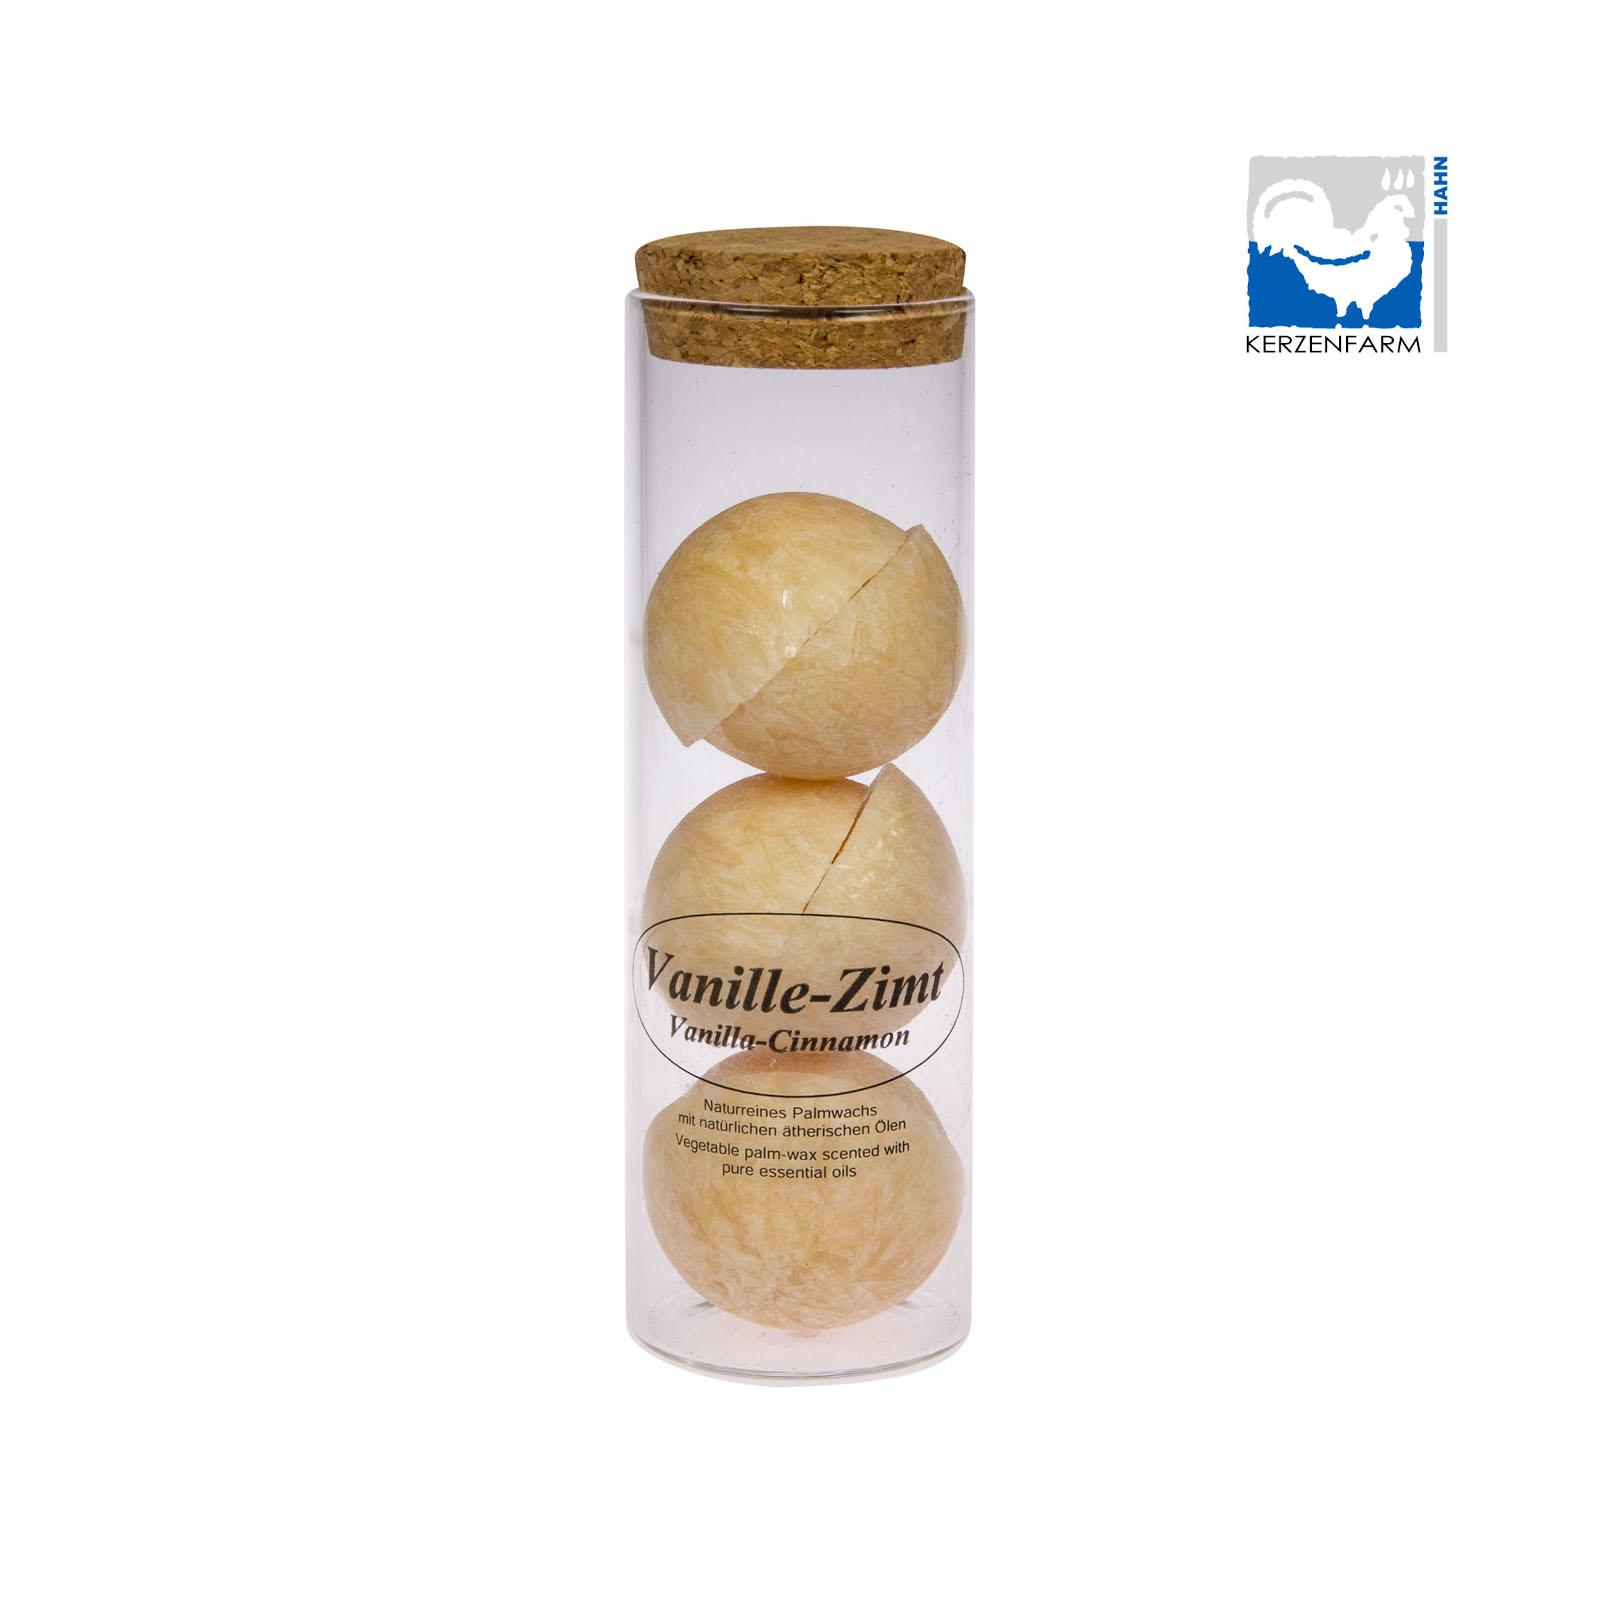 Kerzenfarm Kapsle do aromalampy, Vanilla cinnamon 6 ks, dóza